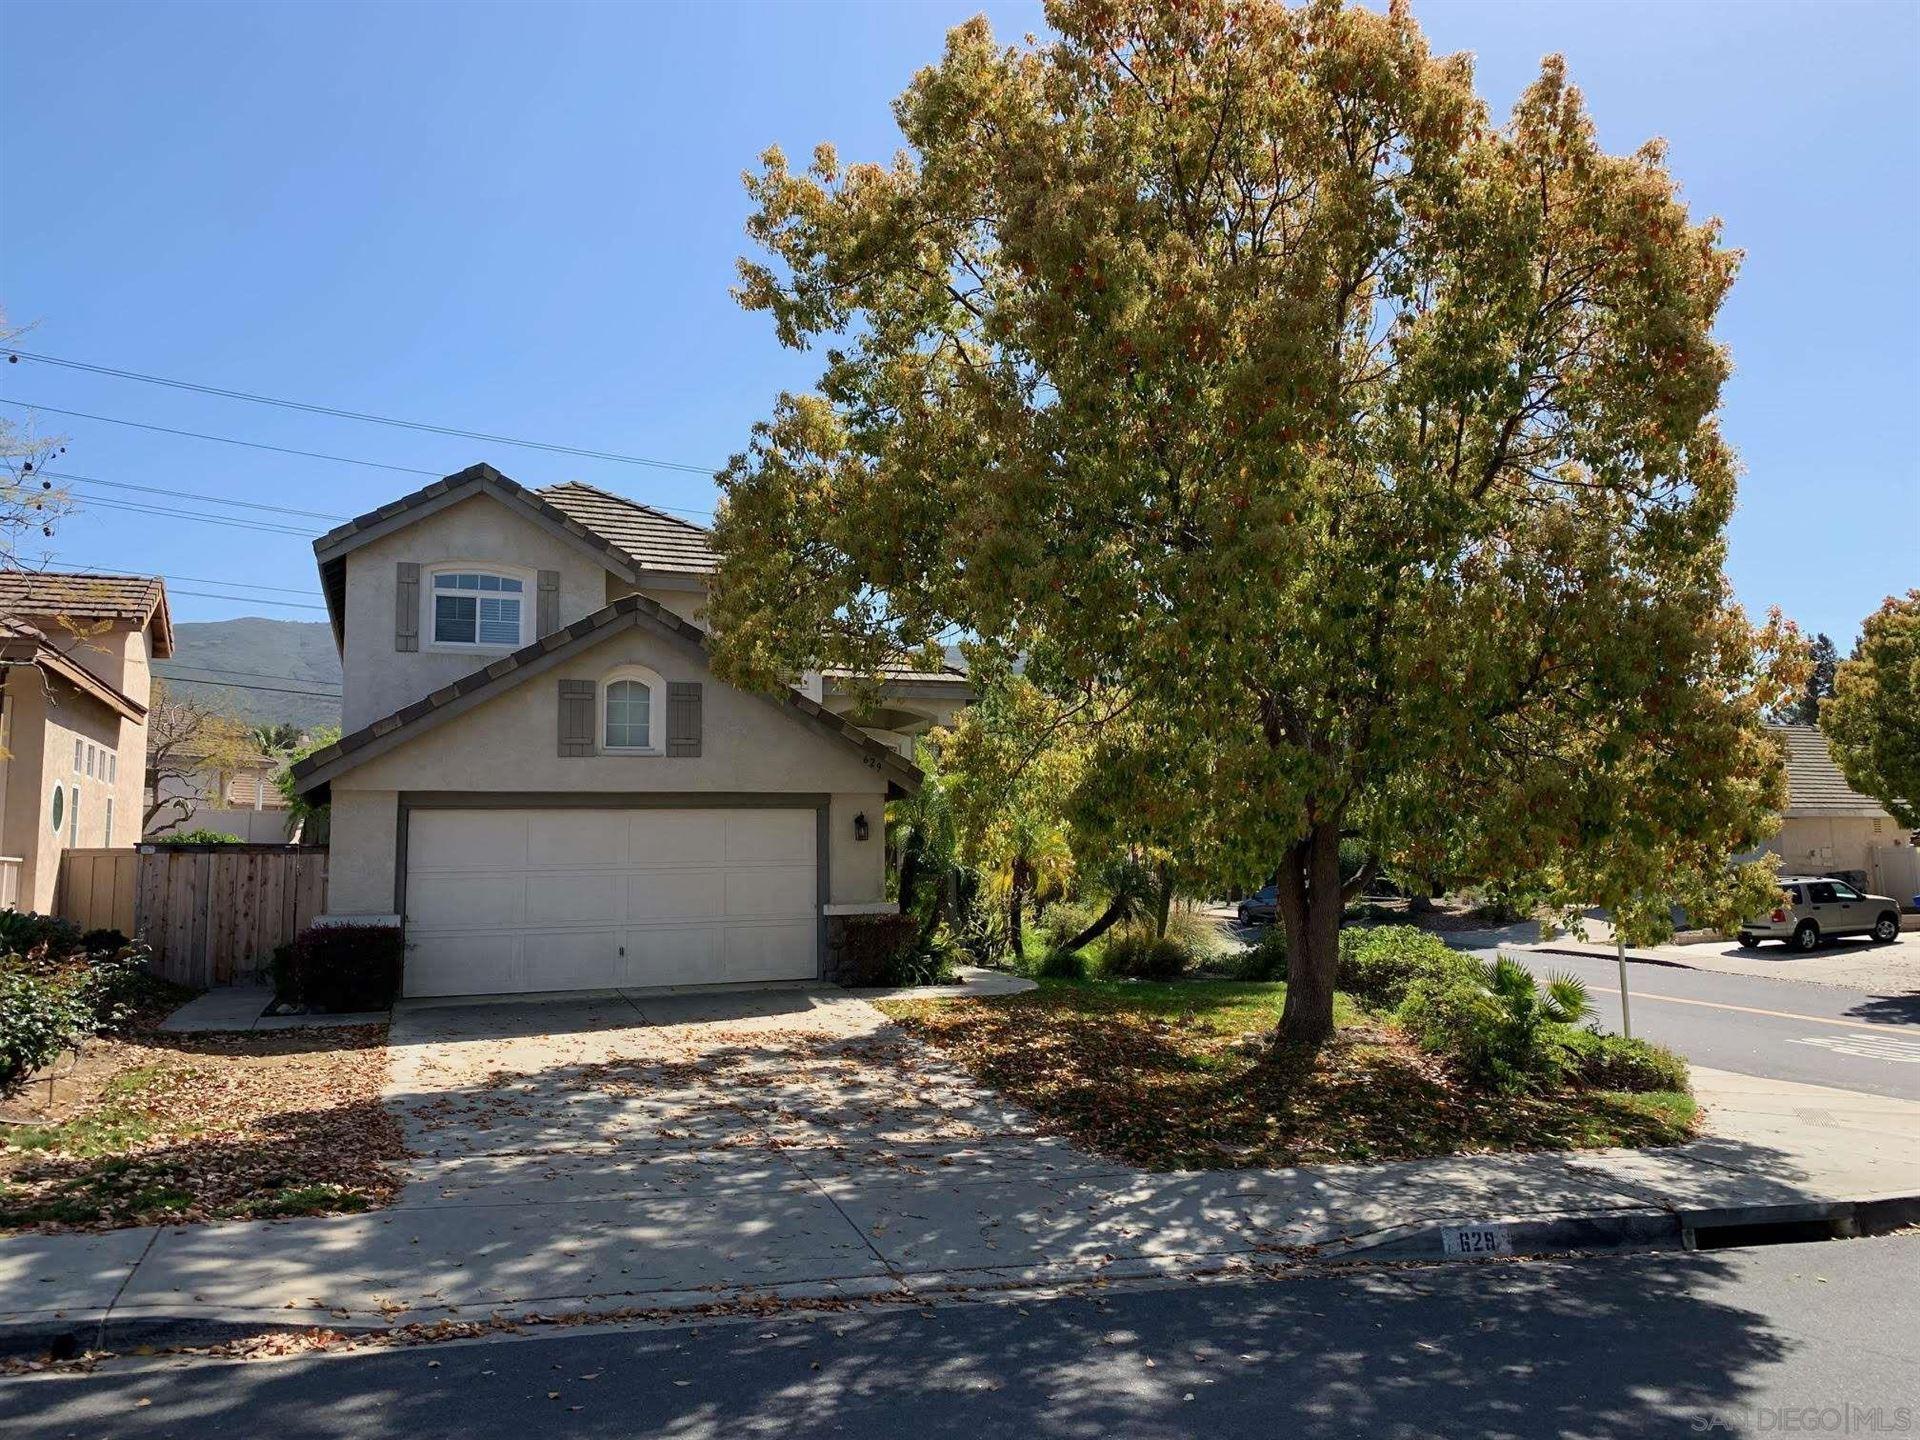 Photo of 629 Buckhorn Ave, San Marcos, CA 92078 (MLS # 210008753)